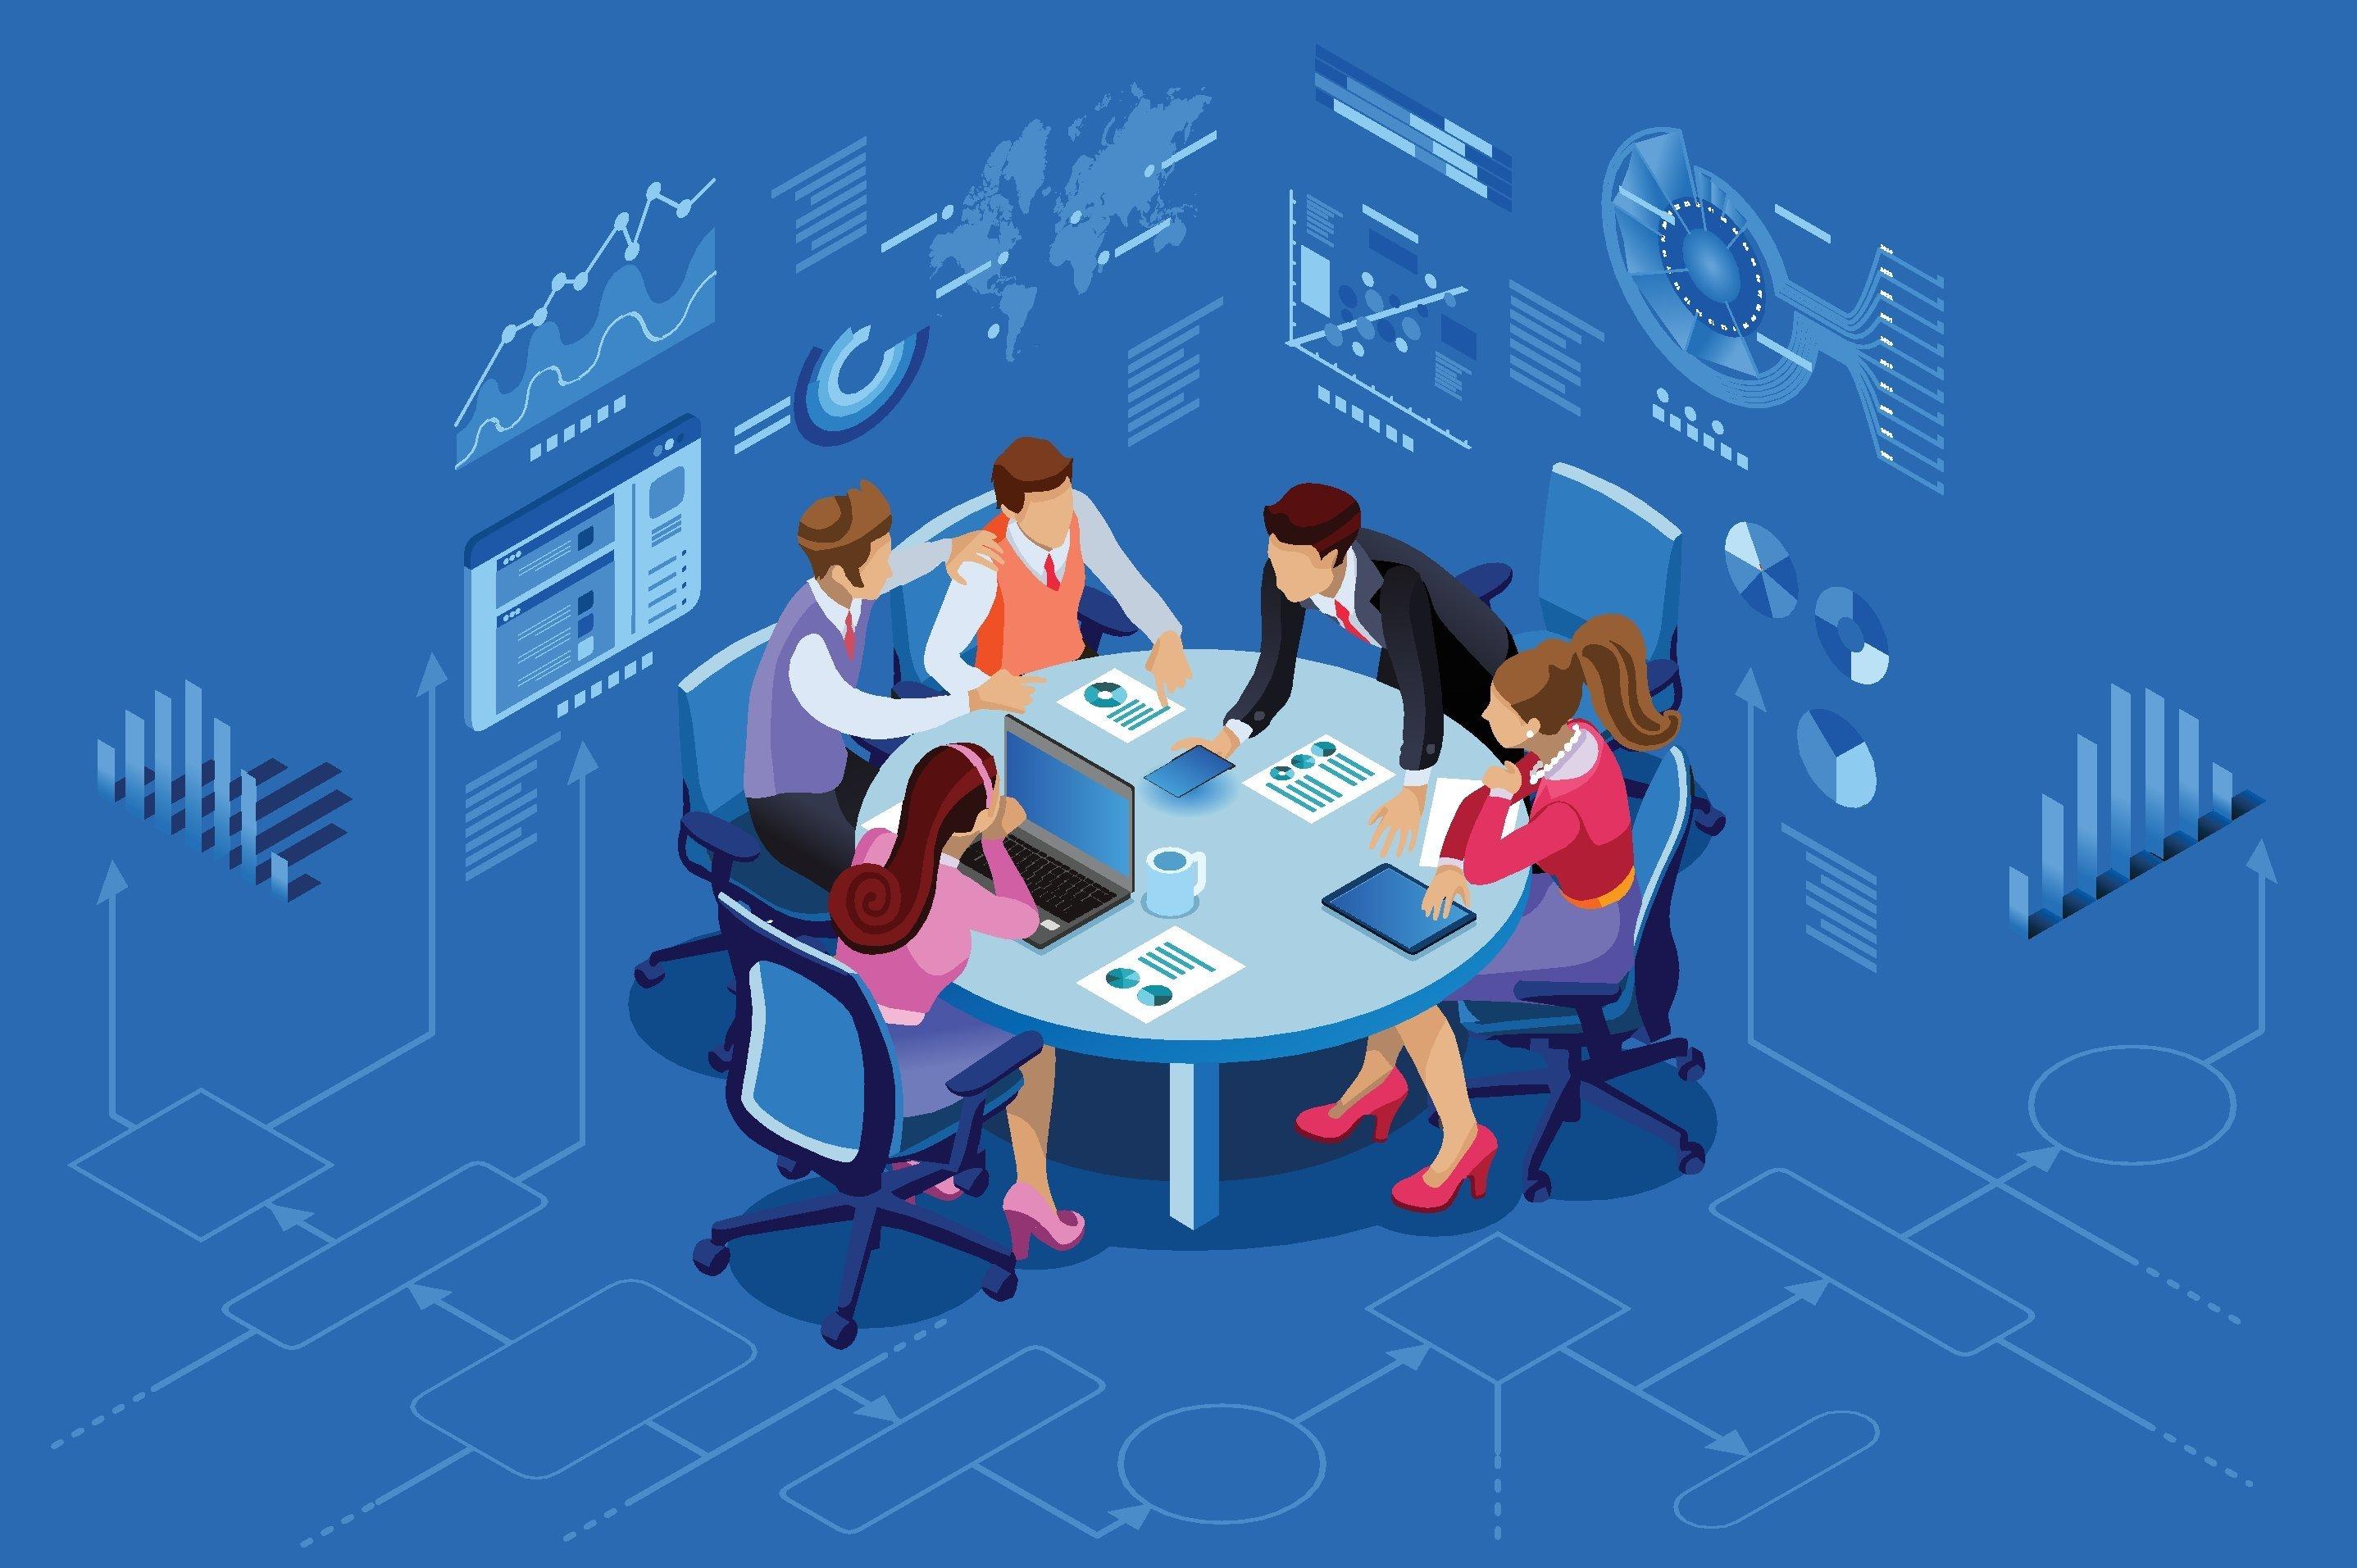 5 Insidious Ways Office Design Can Set You Up To